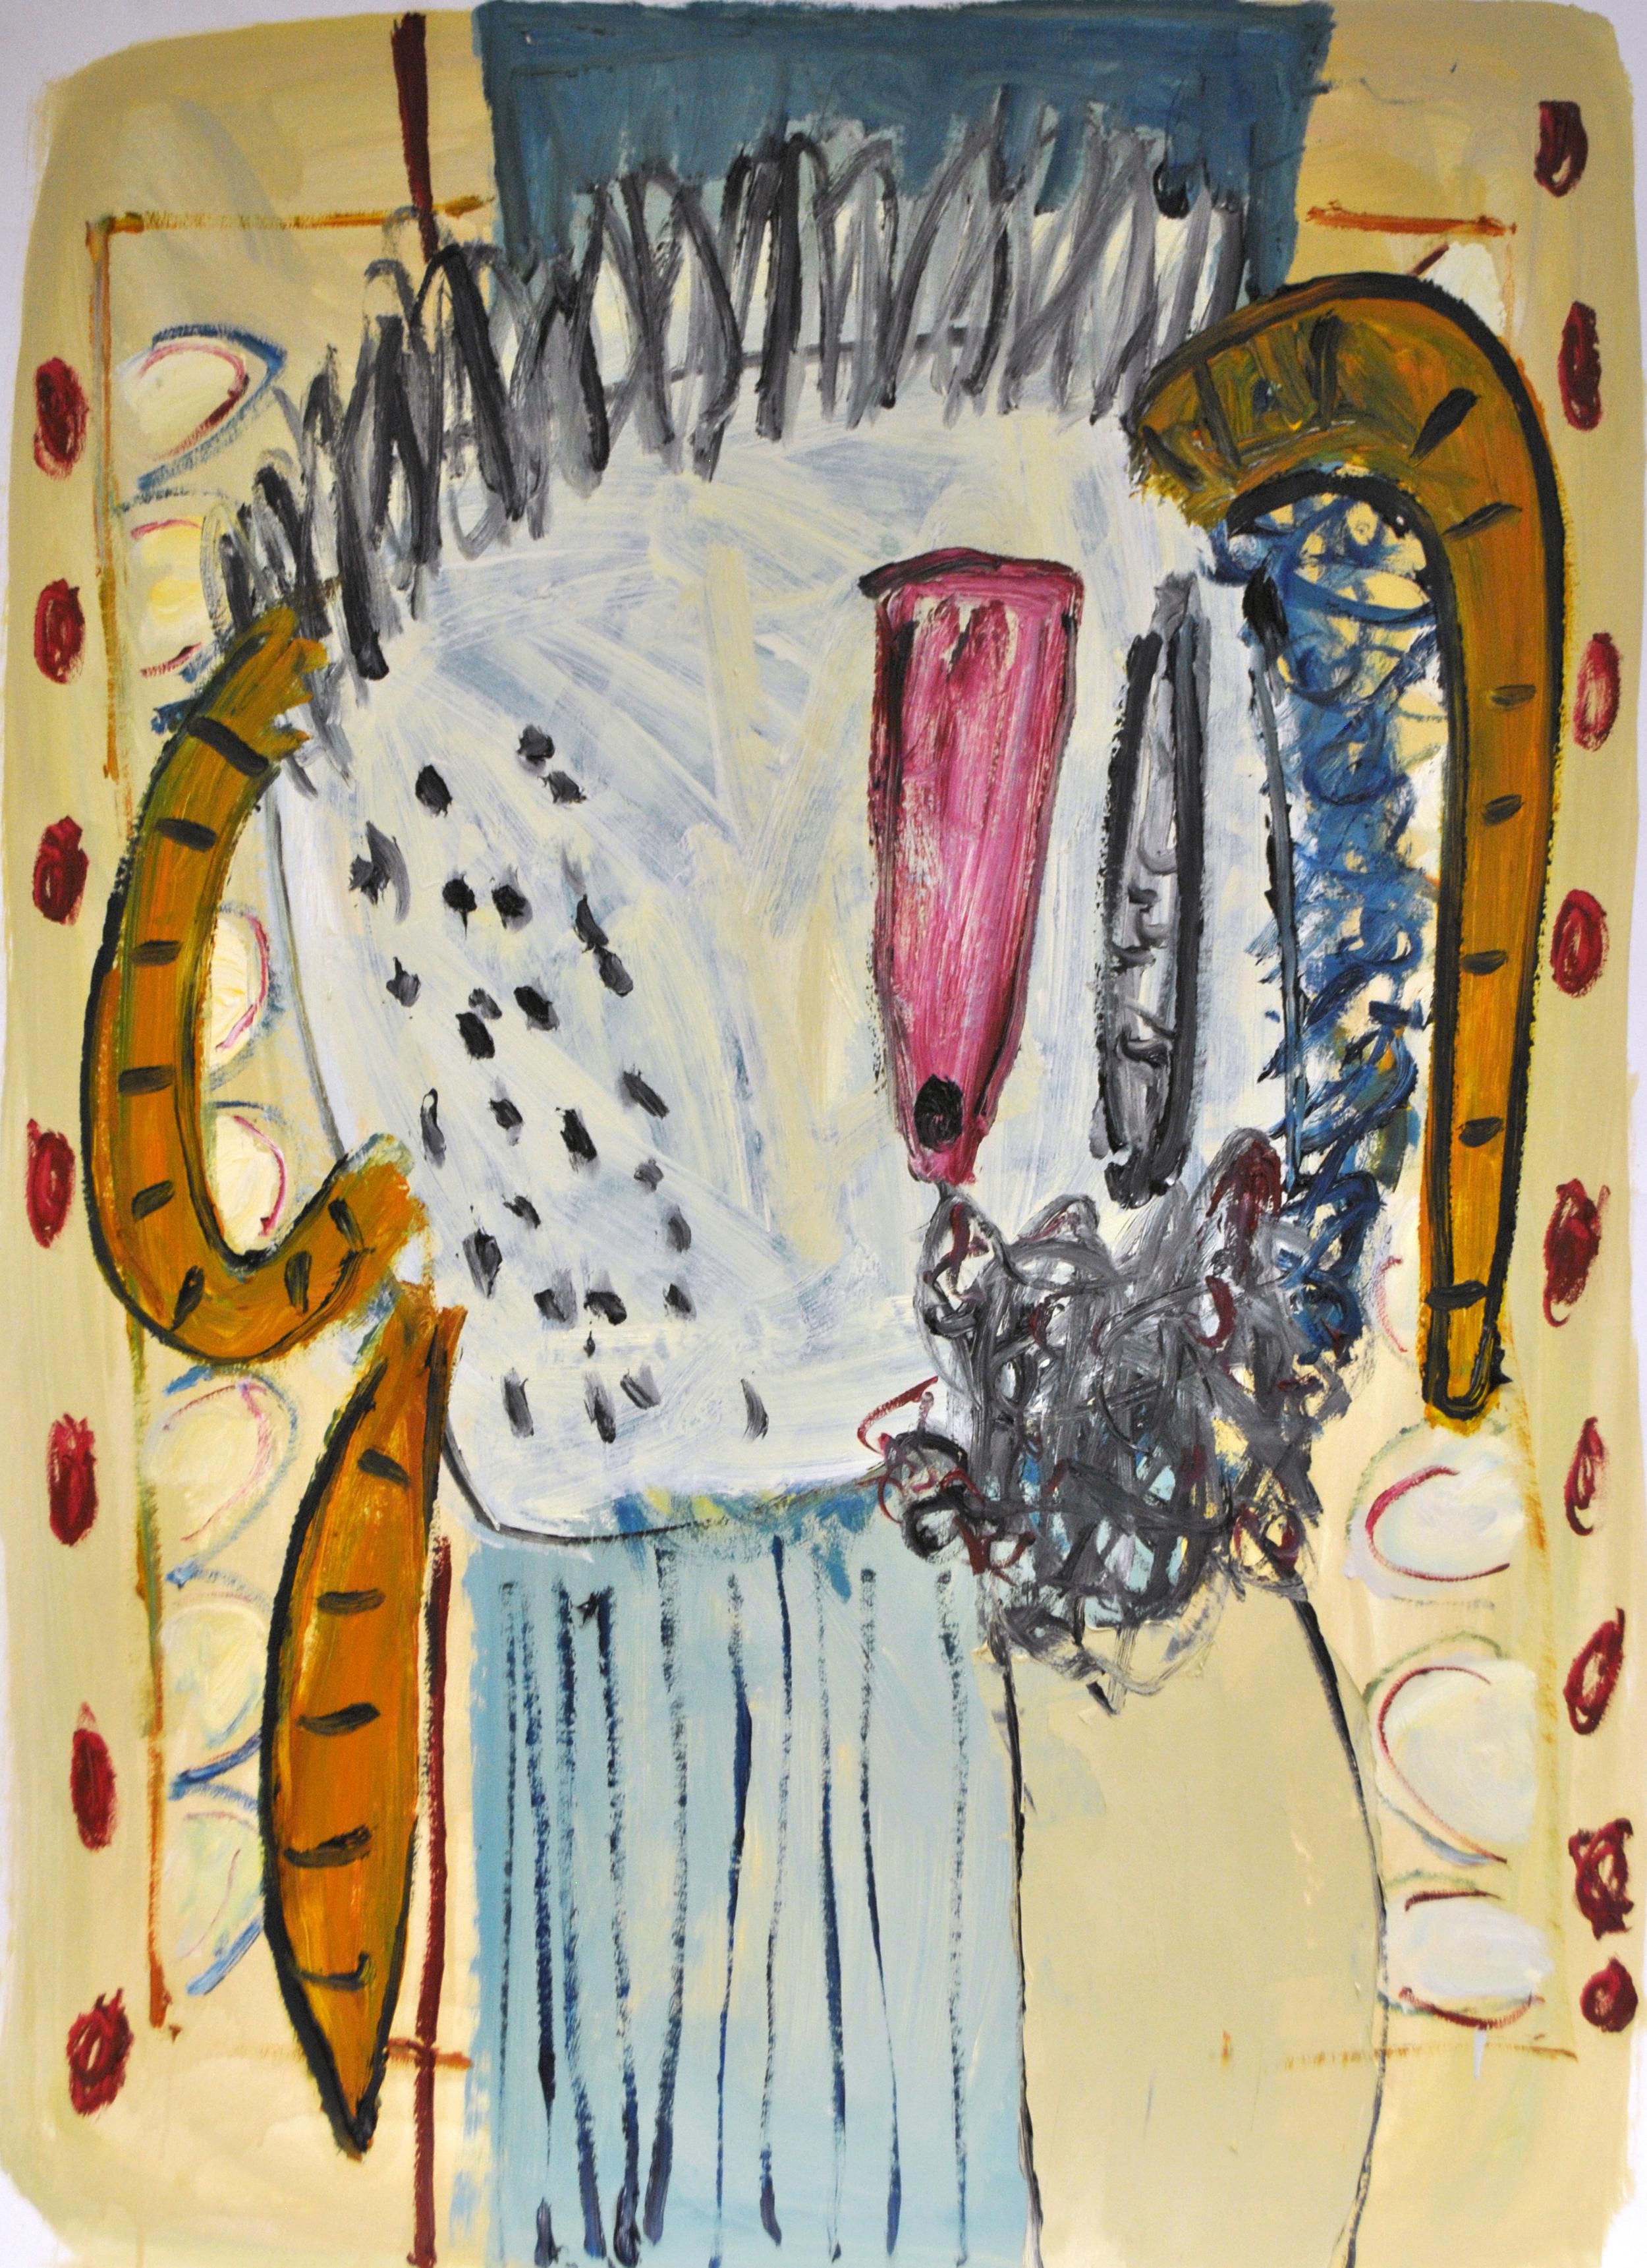 Alec Cumming, Hallaballoo, oil on paper, 91x69cm, 2015.jpg